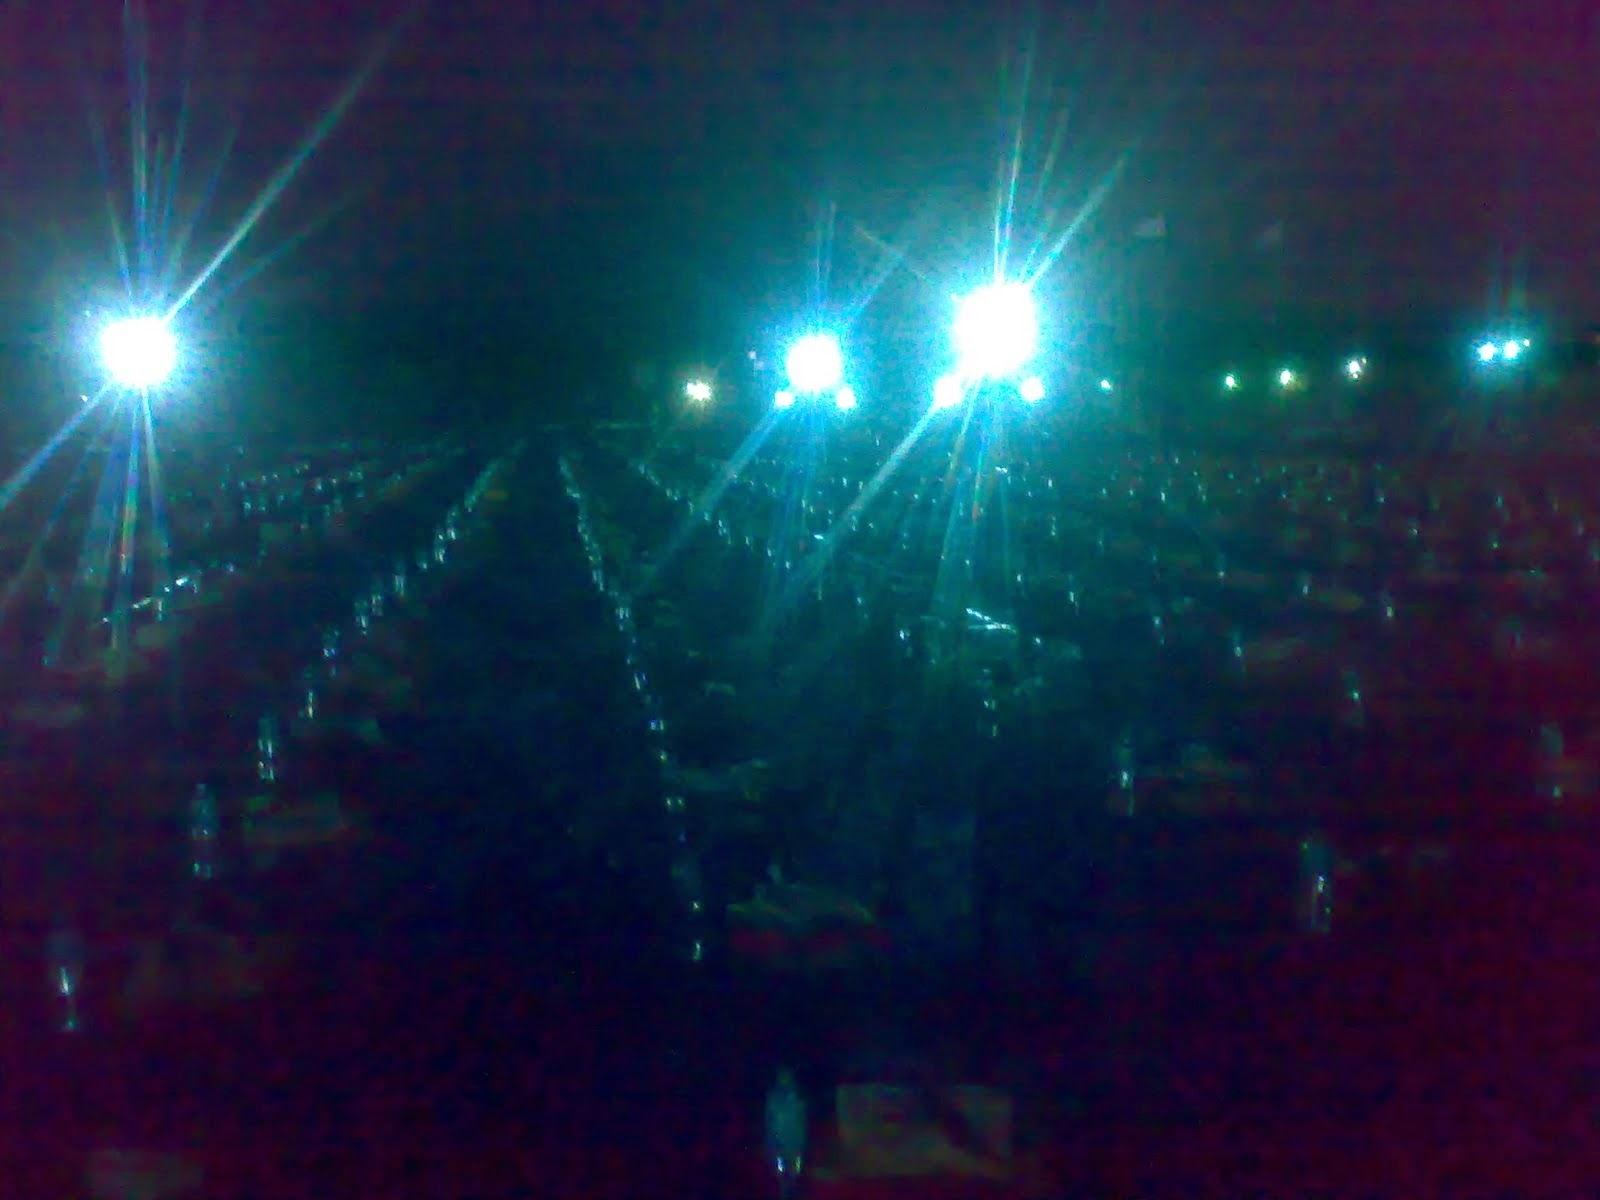 Maximum No Of People Doing Handshake At Khodhaldham Kagwad